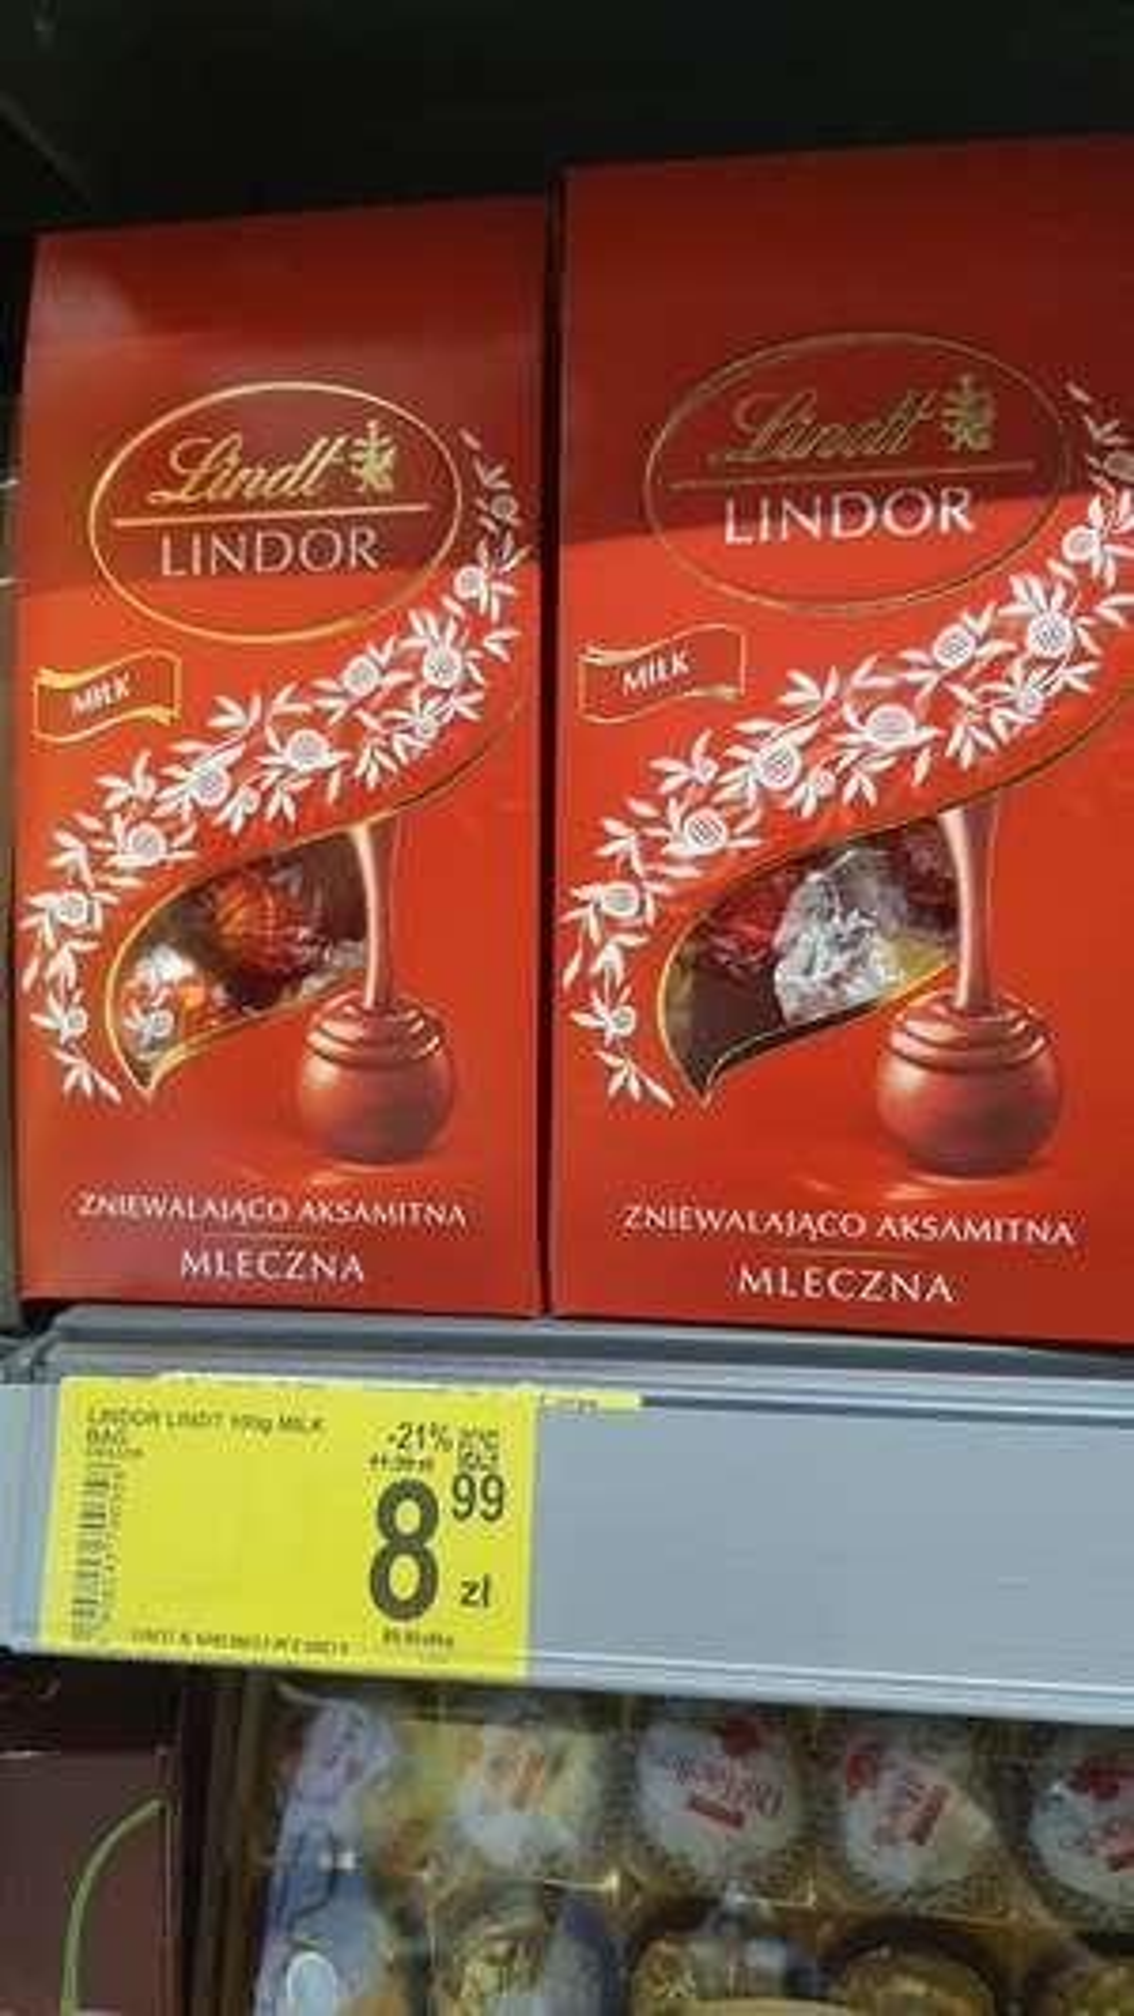 Praliny Lindt Lindor Carrefour